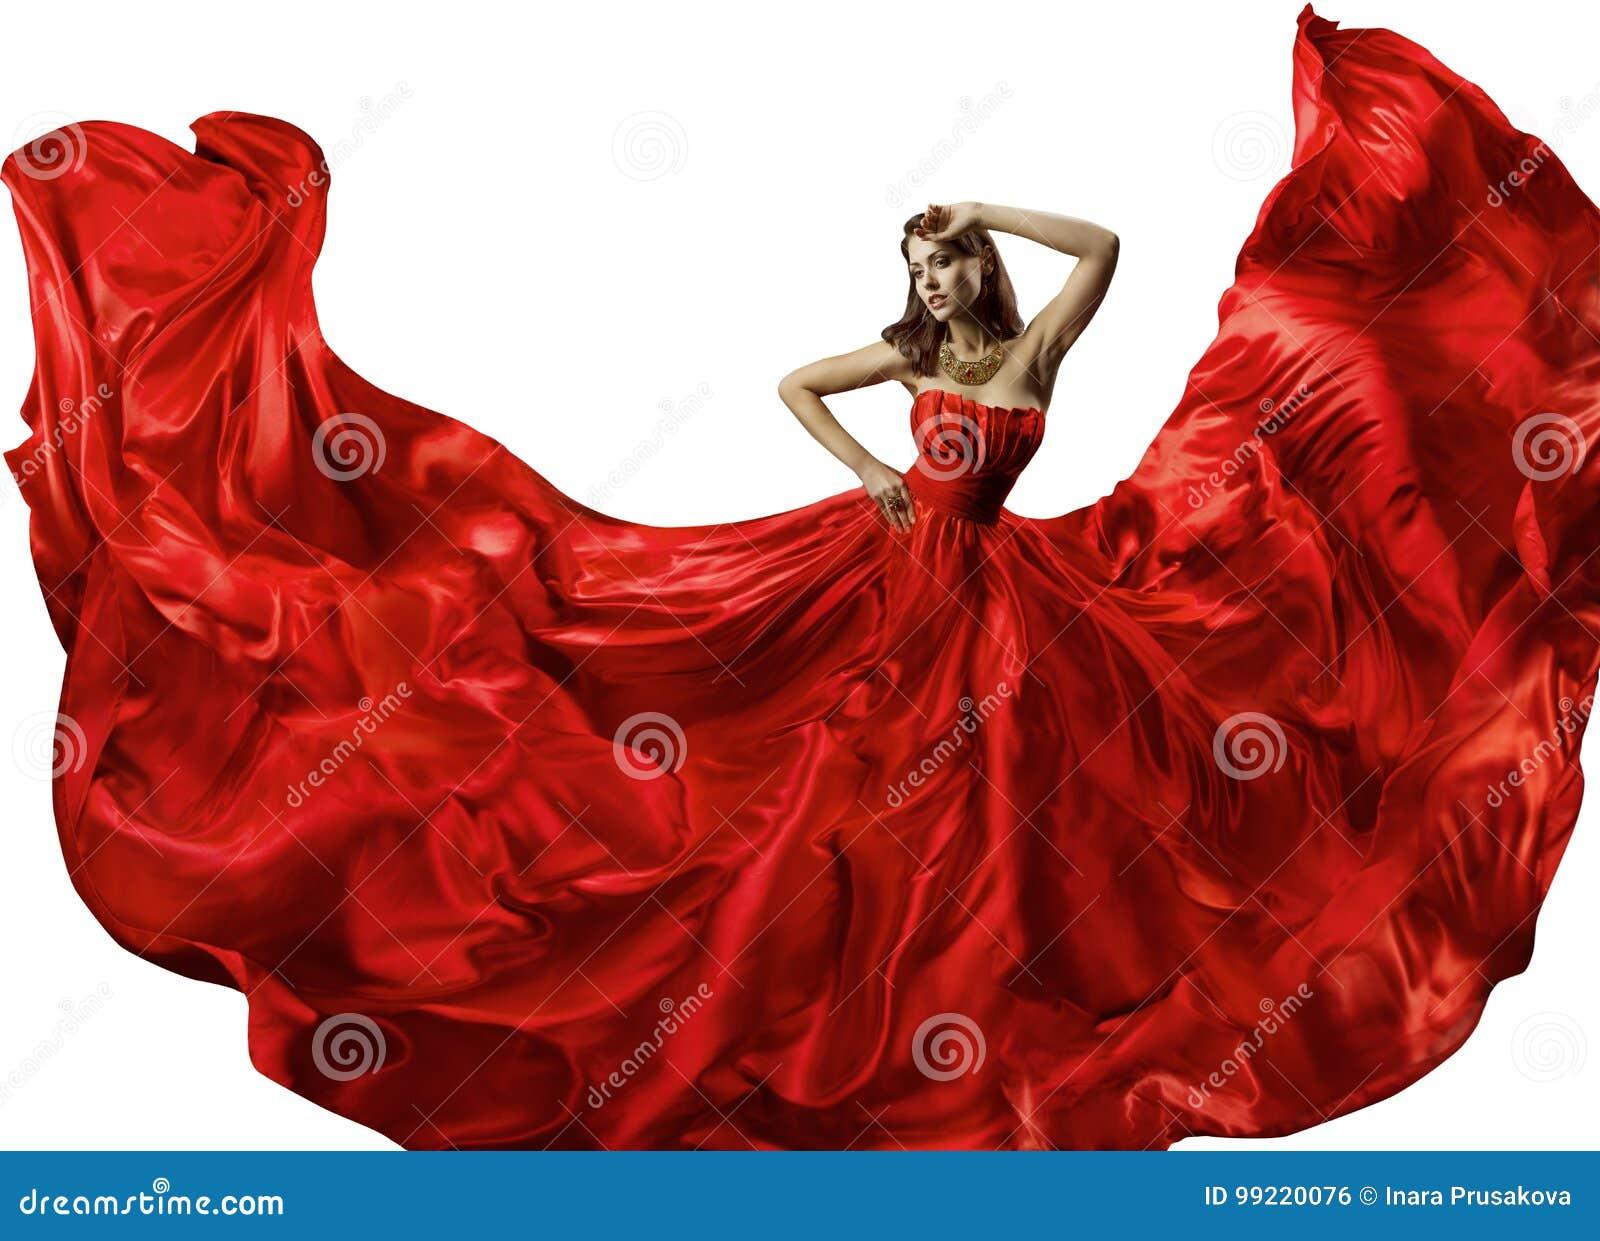 De De Danse Robe Dance Rouge La Femme Silk Dans Dans Ball aB5qxdnRwn